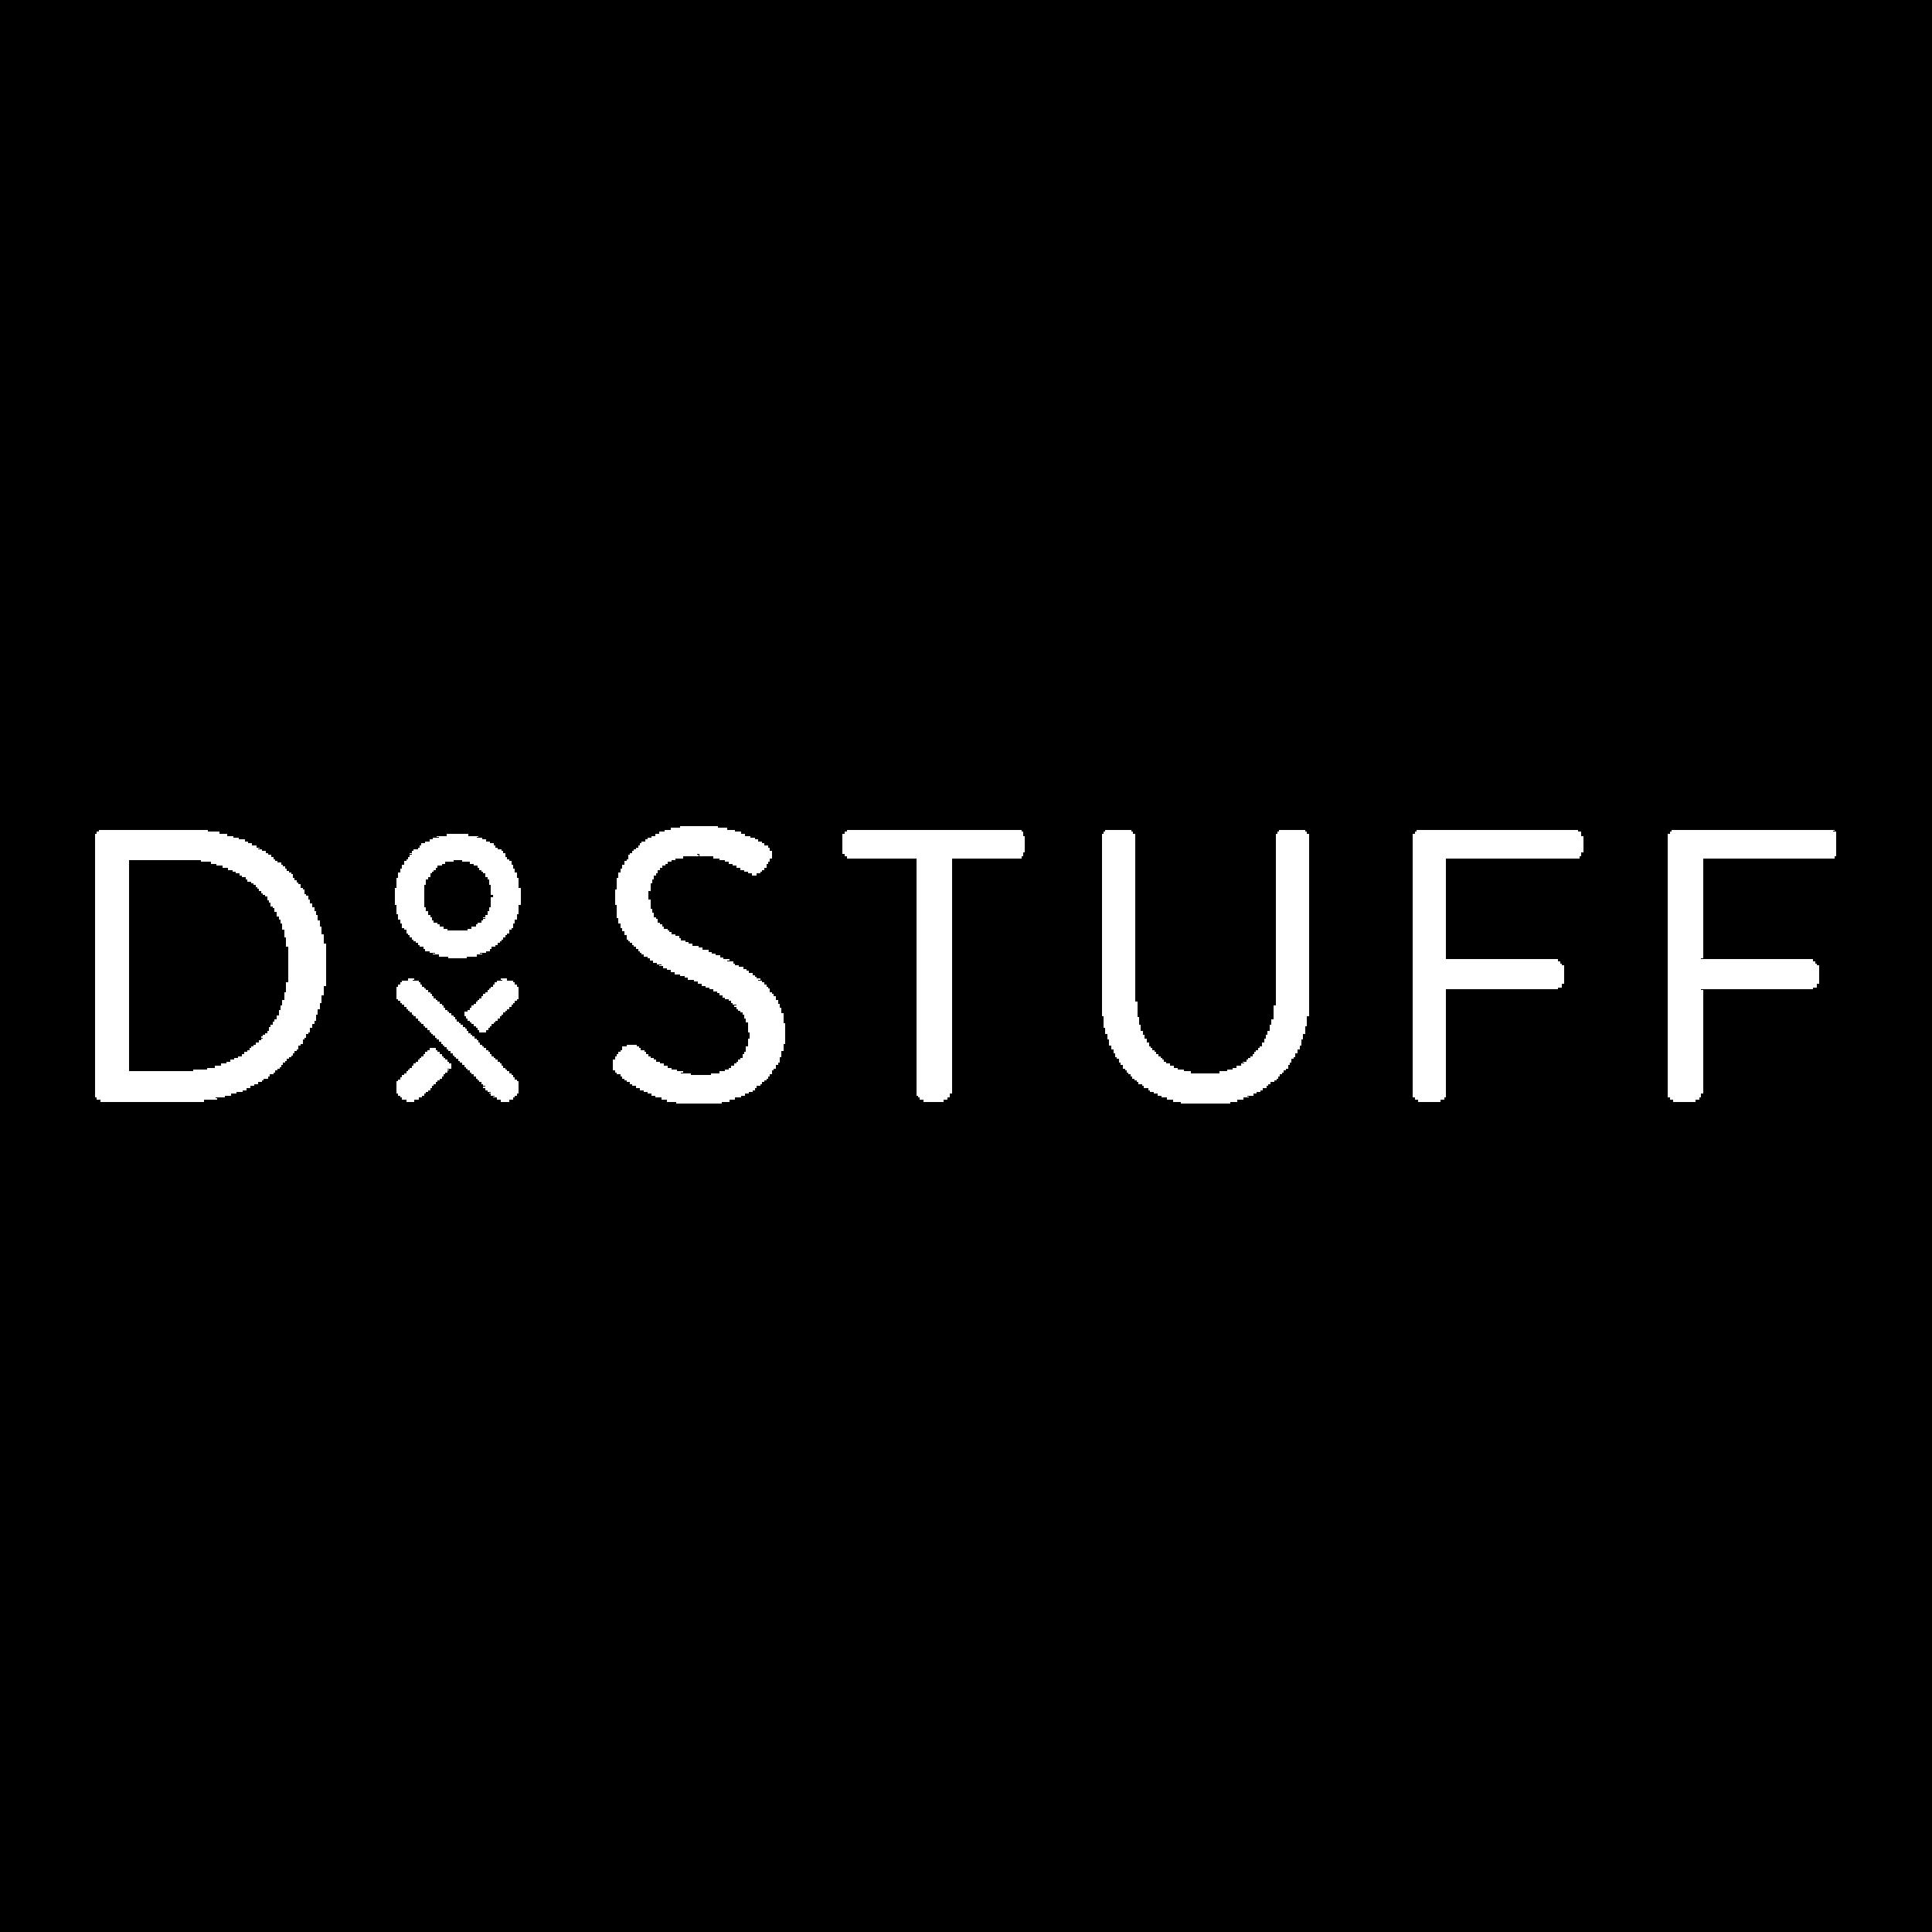 dostuff-white-logo-01.png